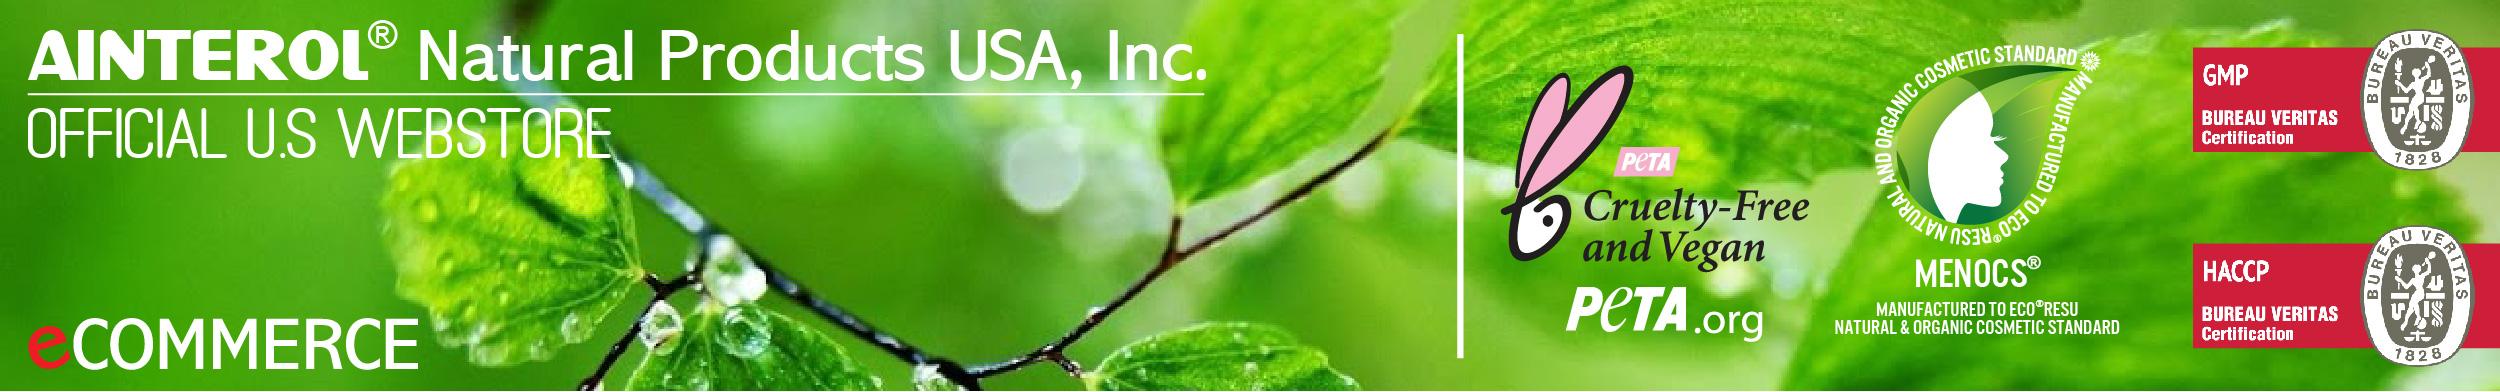 AINTEROL Natural Products USA, Inc.